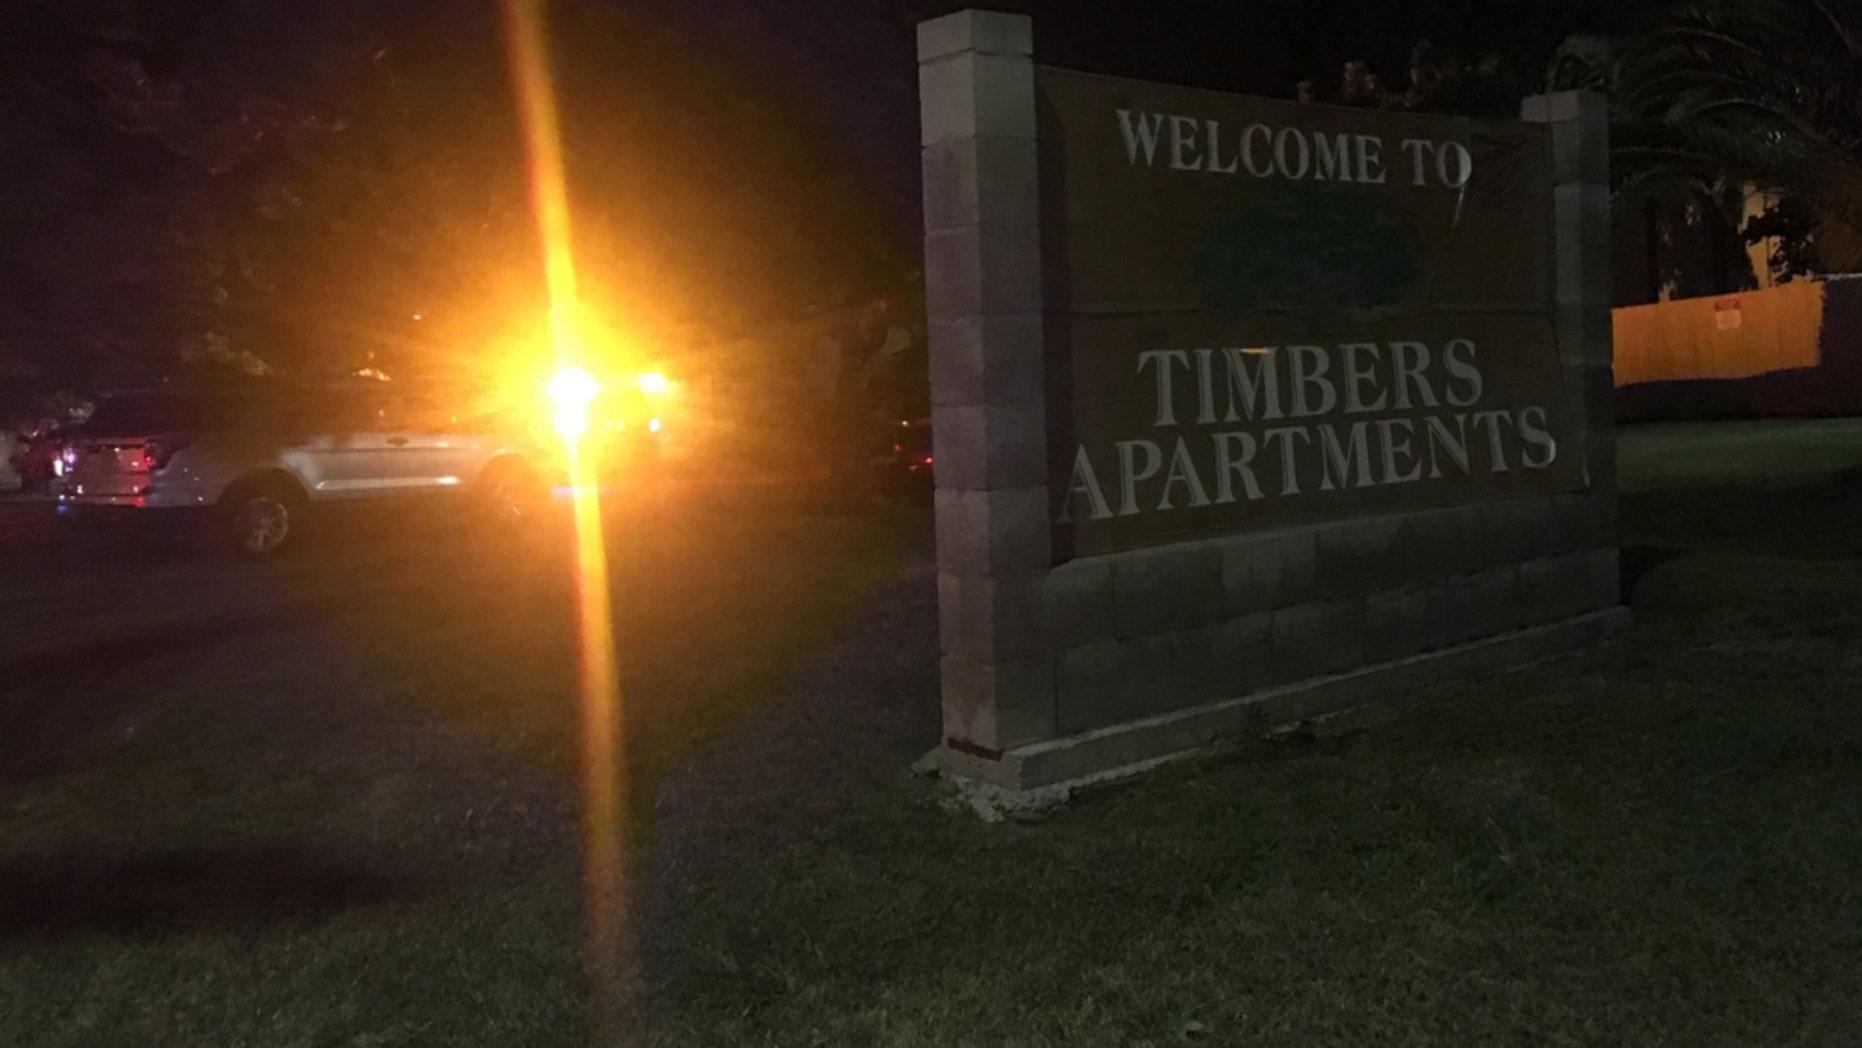 The apartment complex in West Sacramento where police say 3 children were found dead.